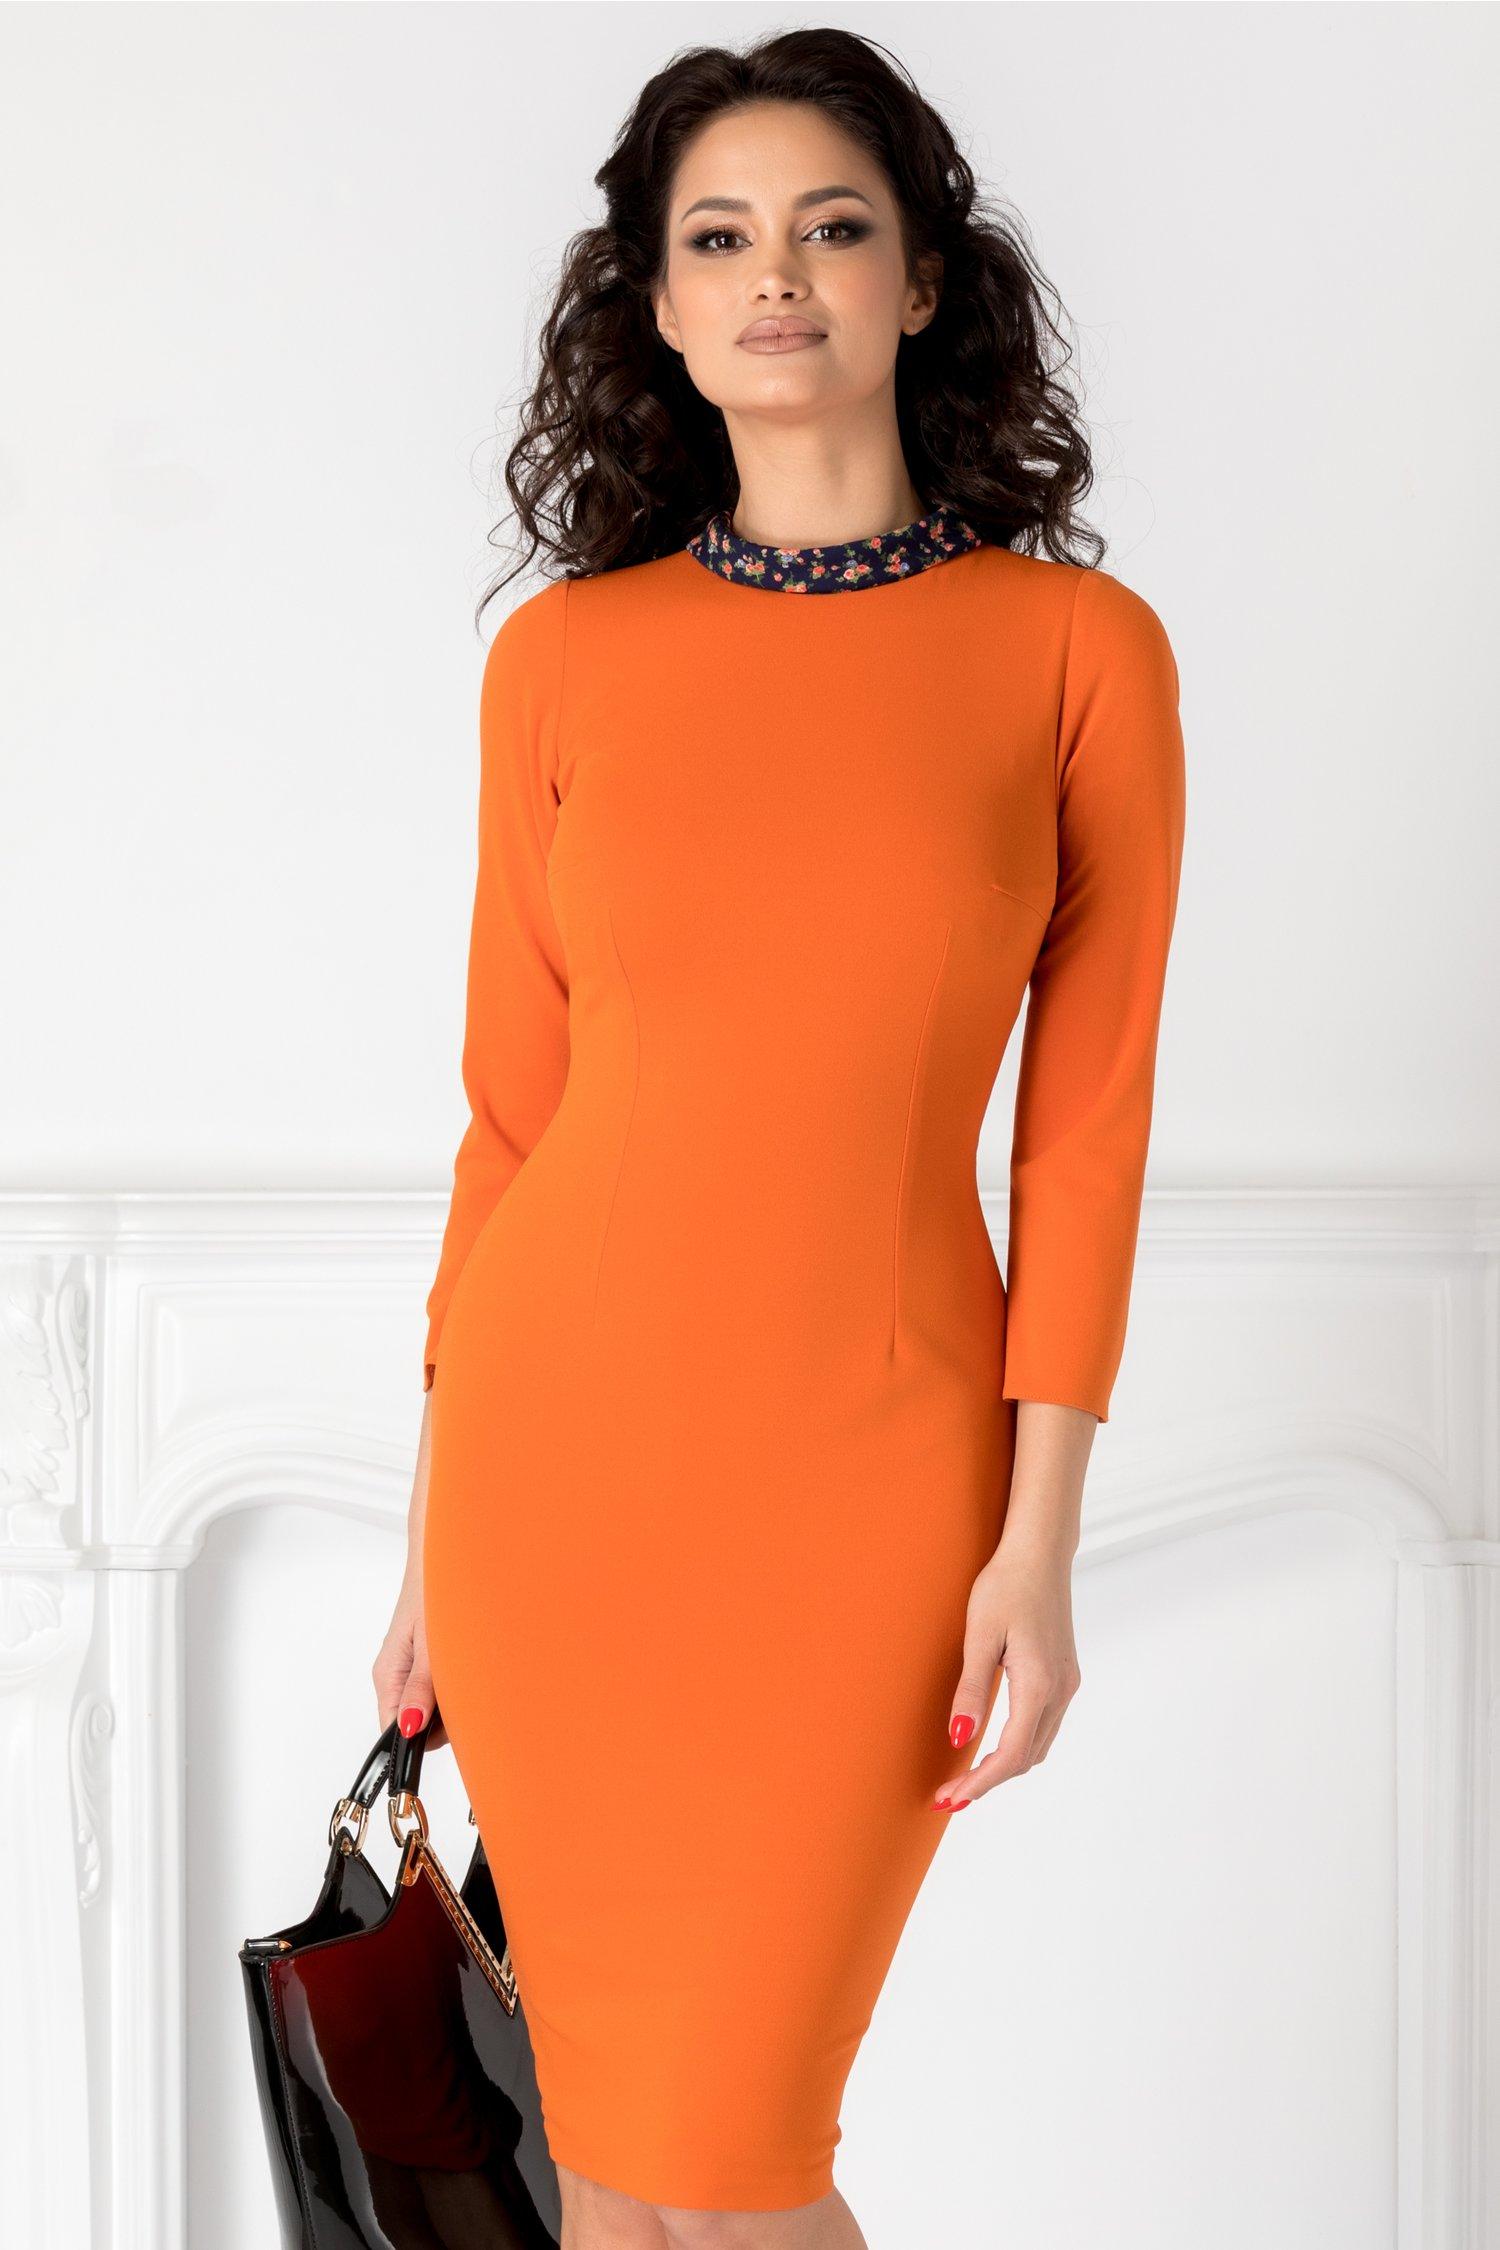 Rochie Moze oranj cu guler bleumarin inflorat